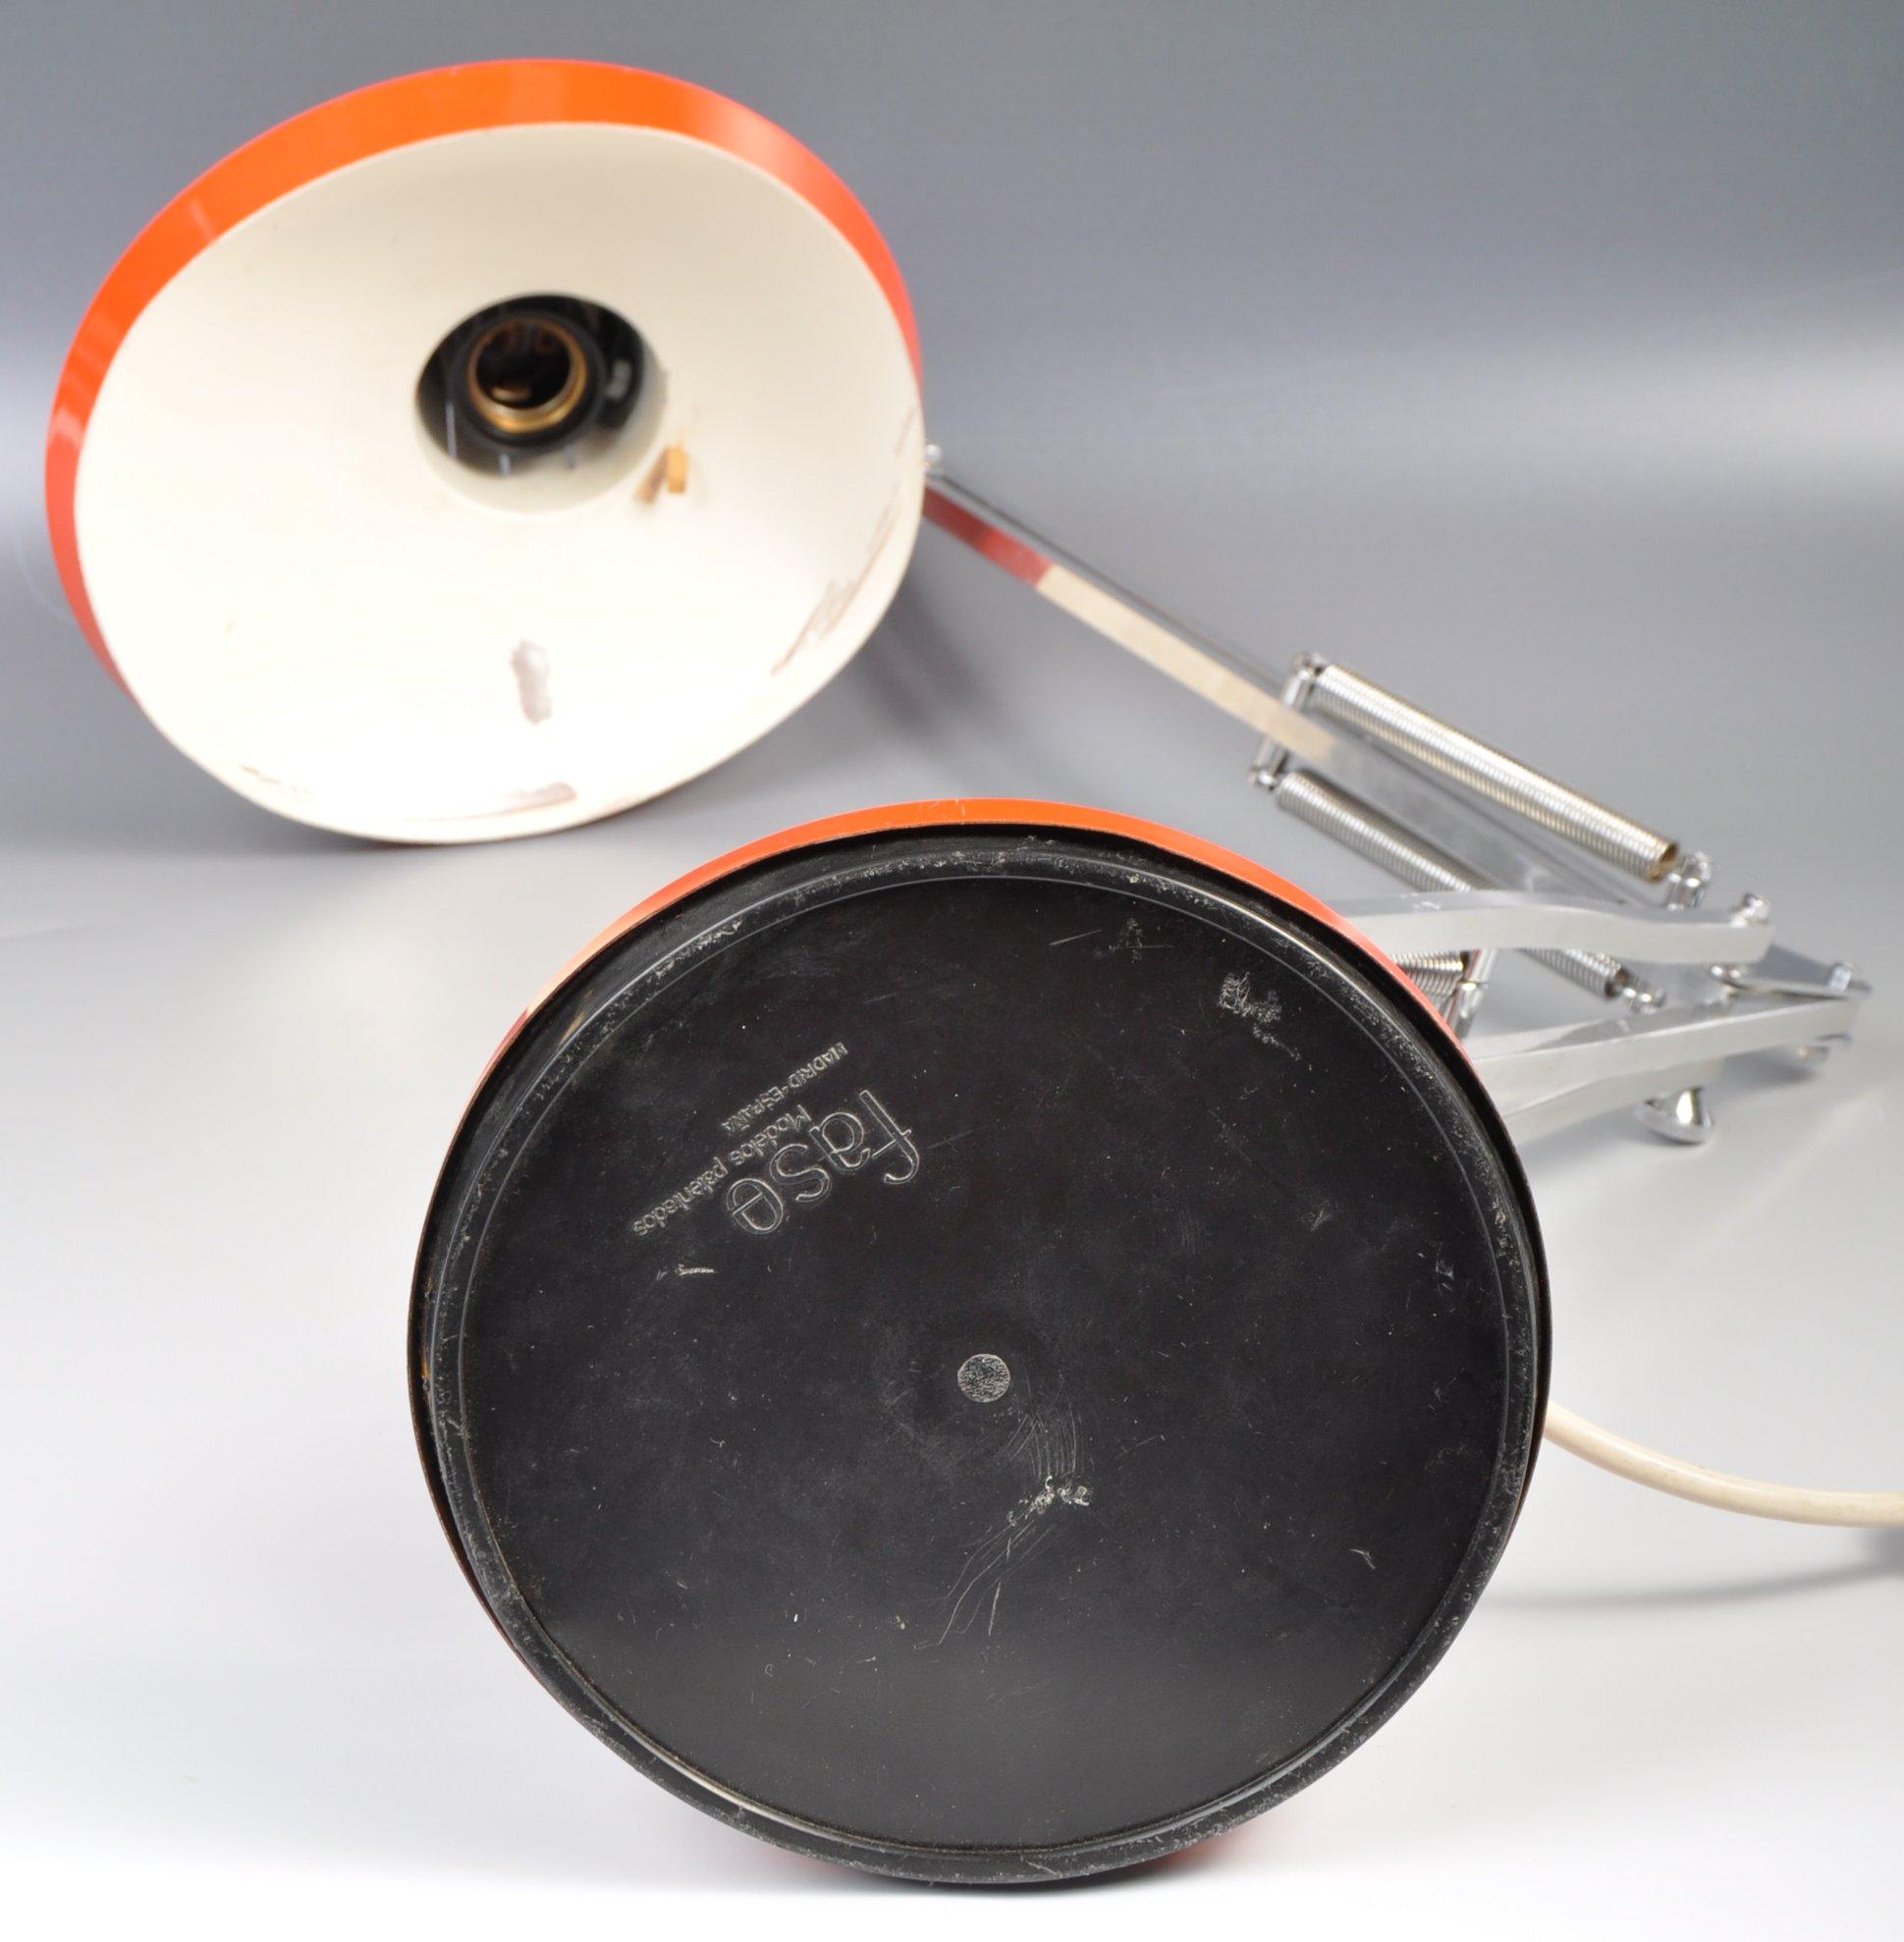 Lot 9 - FANTASTIC FASE MADE 1960'S CHROME AND ENAMEL ANGLEPOISE DESK LAMP